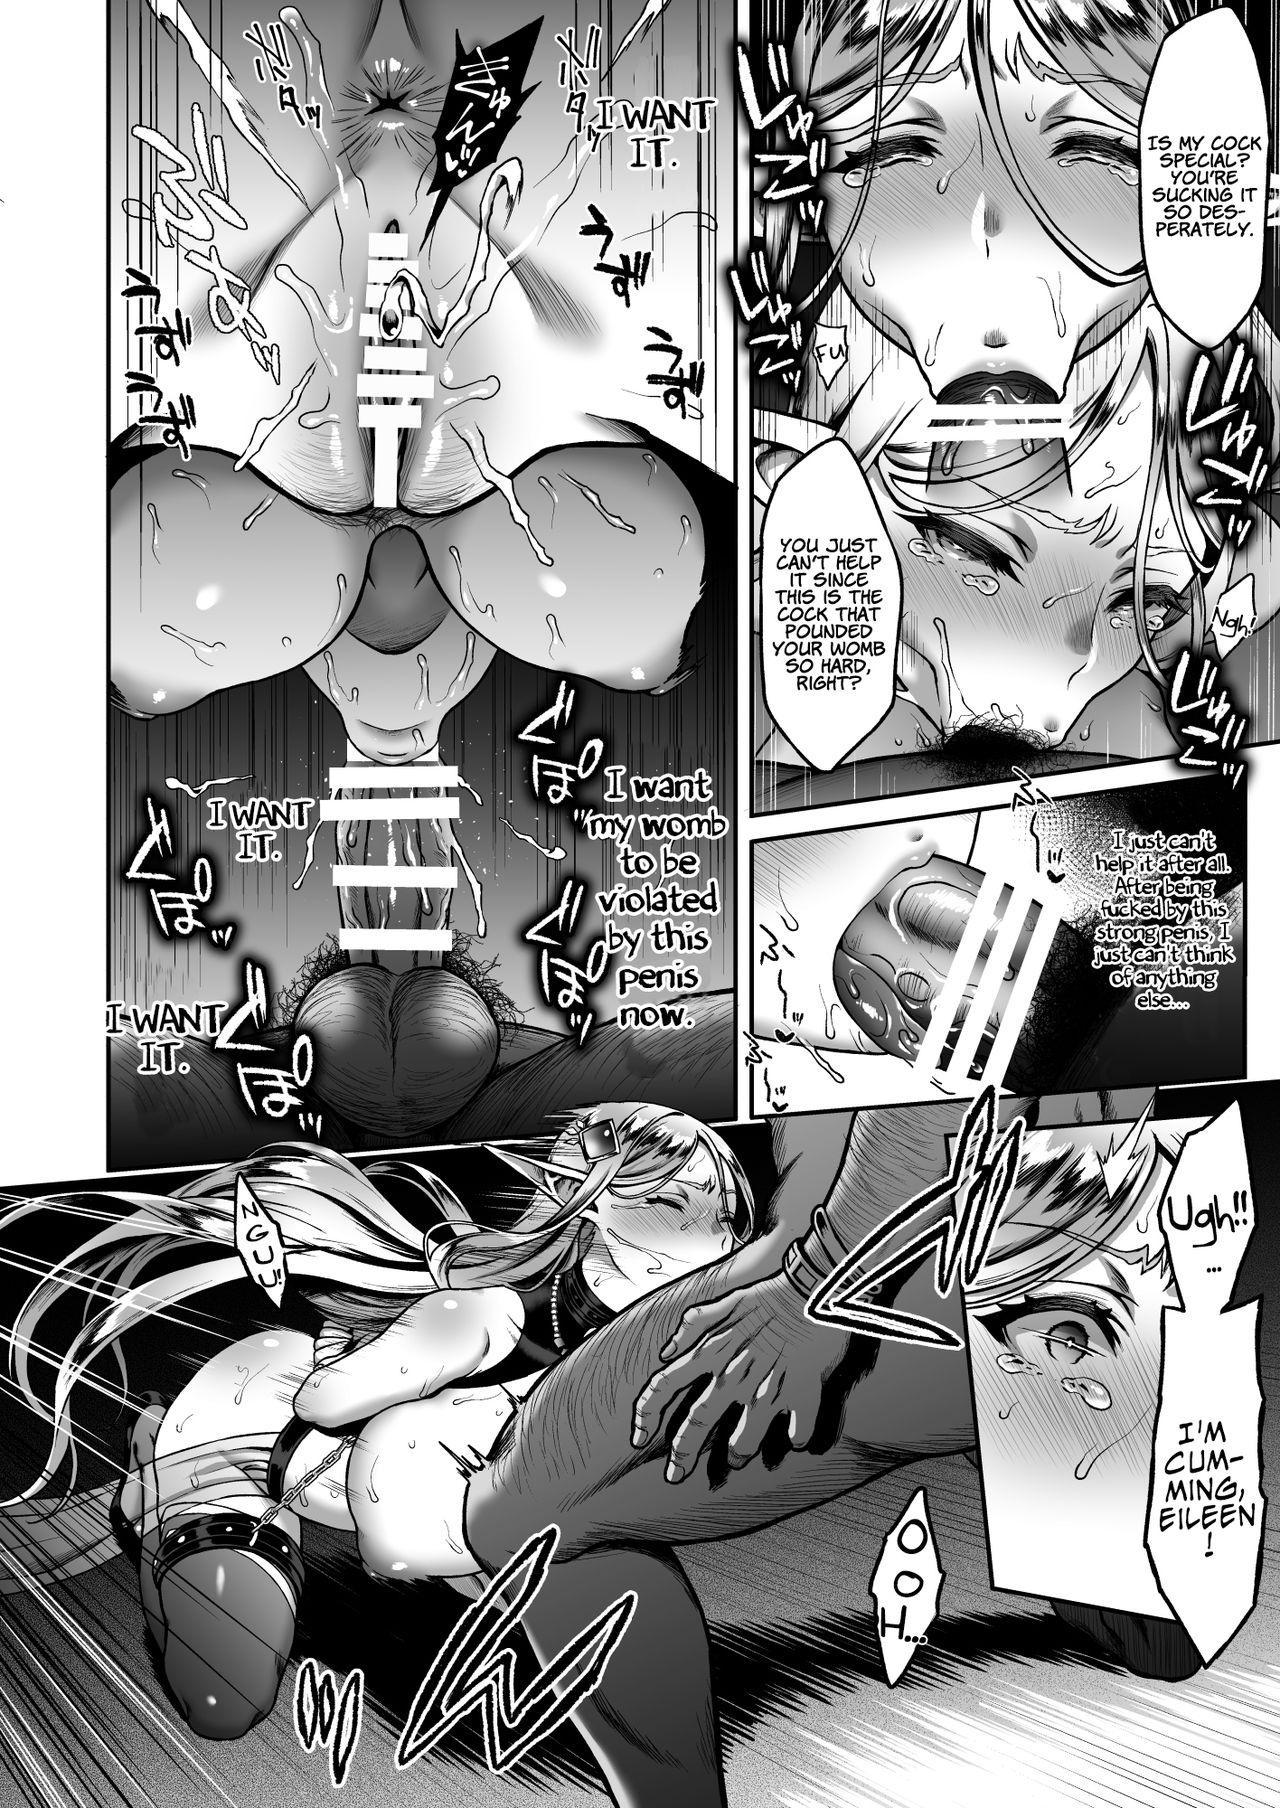 Tasogare no Shou Elf 5 | The Melancholy of the Prostitute Elf 5 18